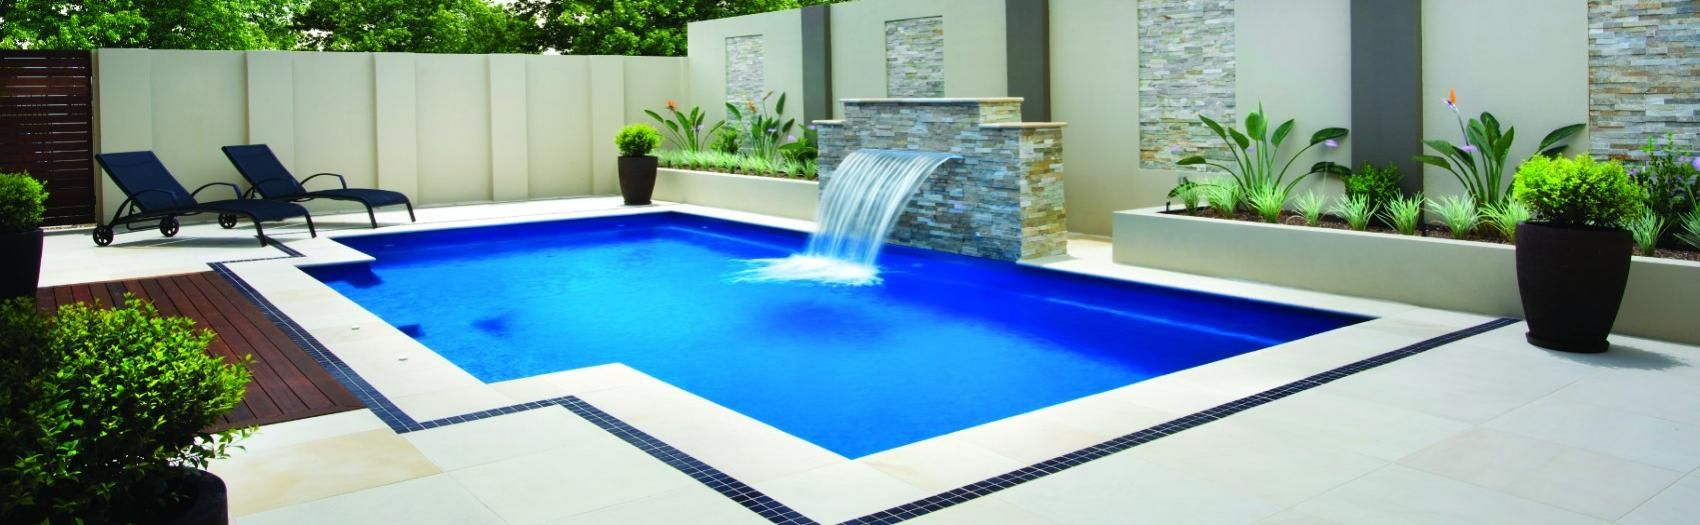 Fiberglass Swimming Pools Leisure Pools Usa Pool Designs Swimming Pools Fiberglass Swimming Pools